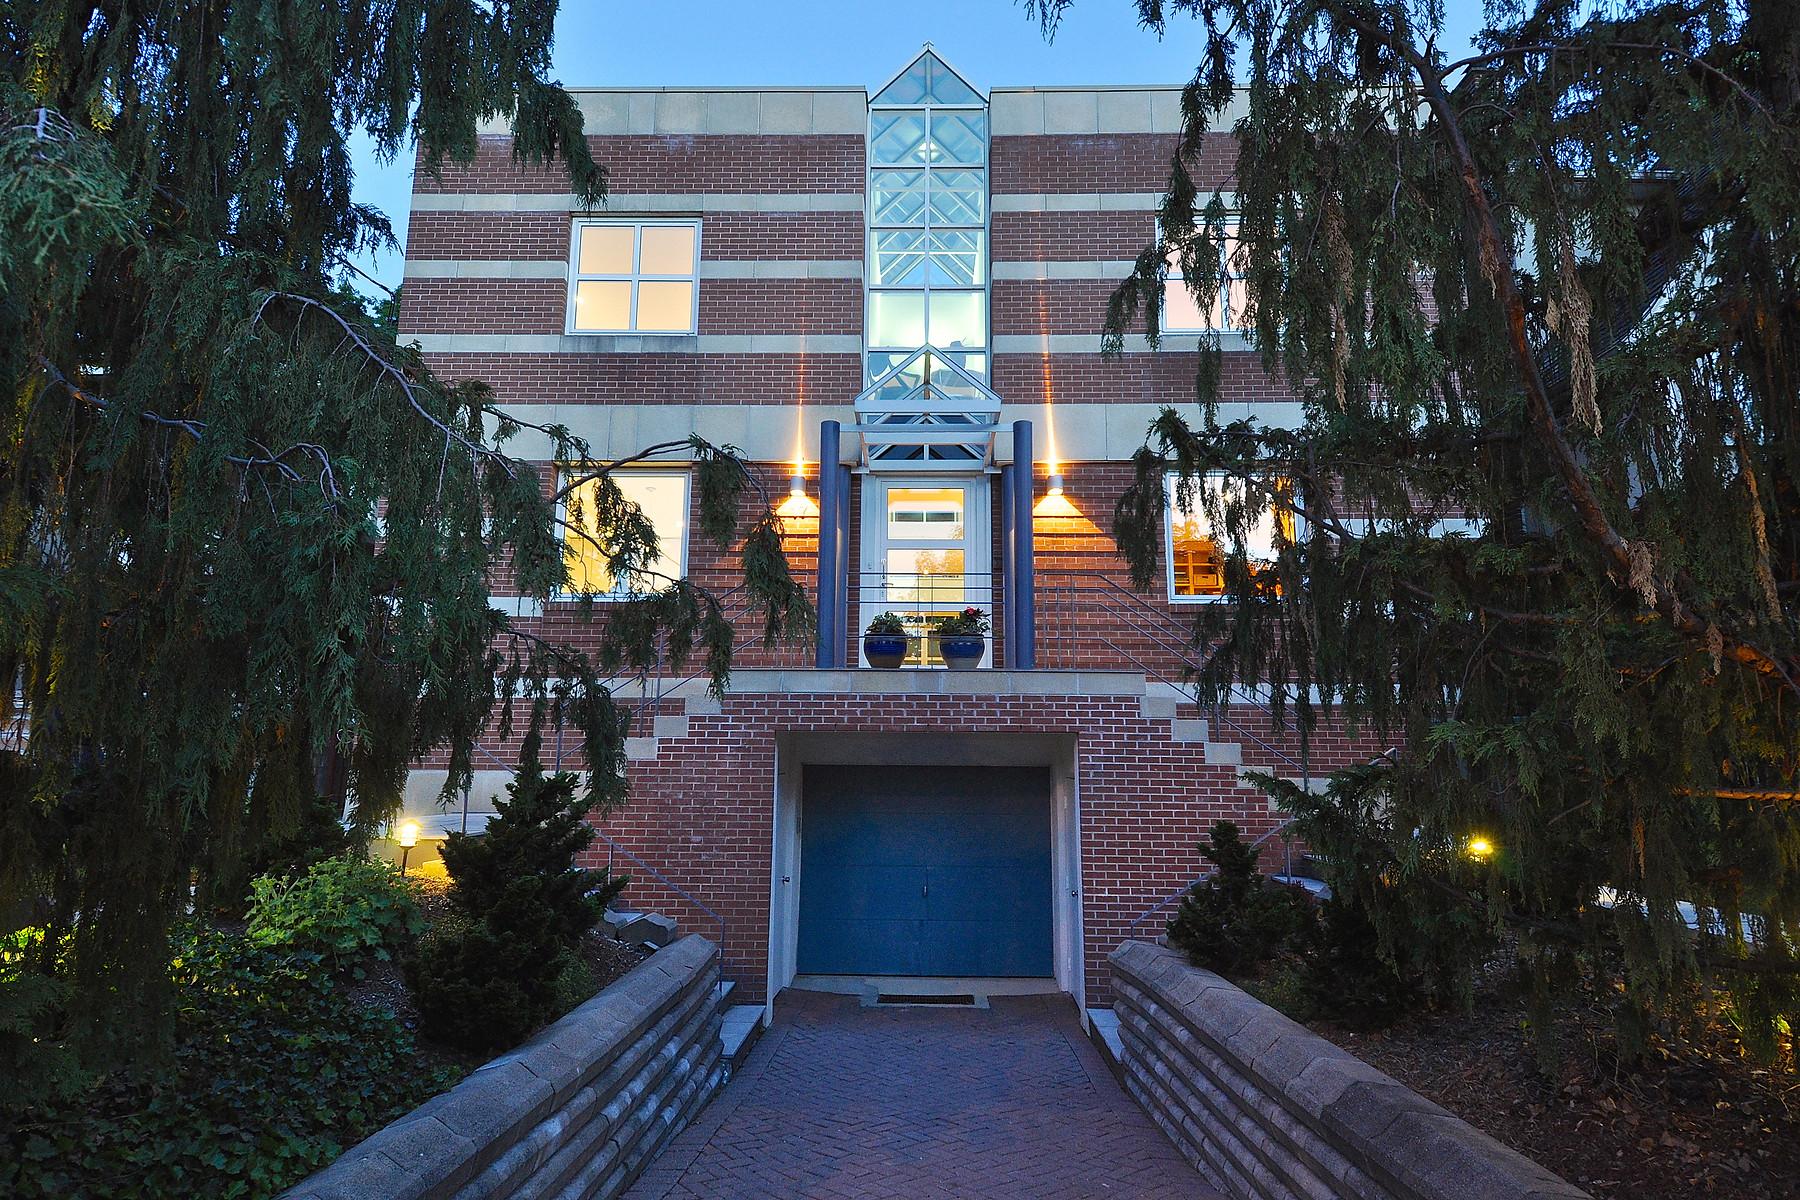 Property For Sale at 17 Douglas Crescent, Toronto